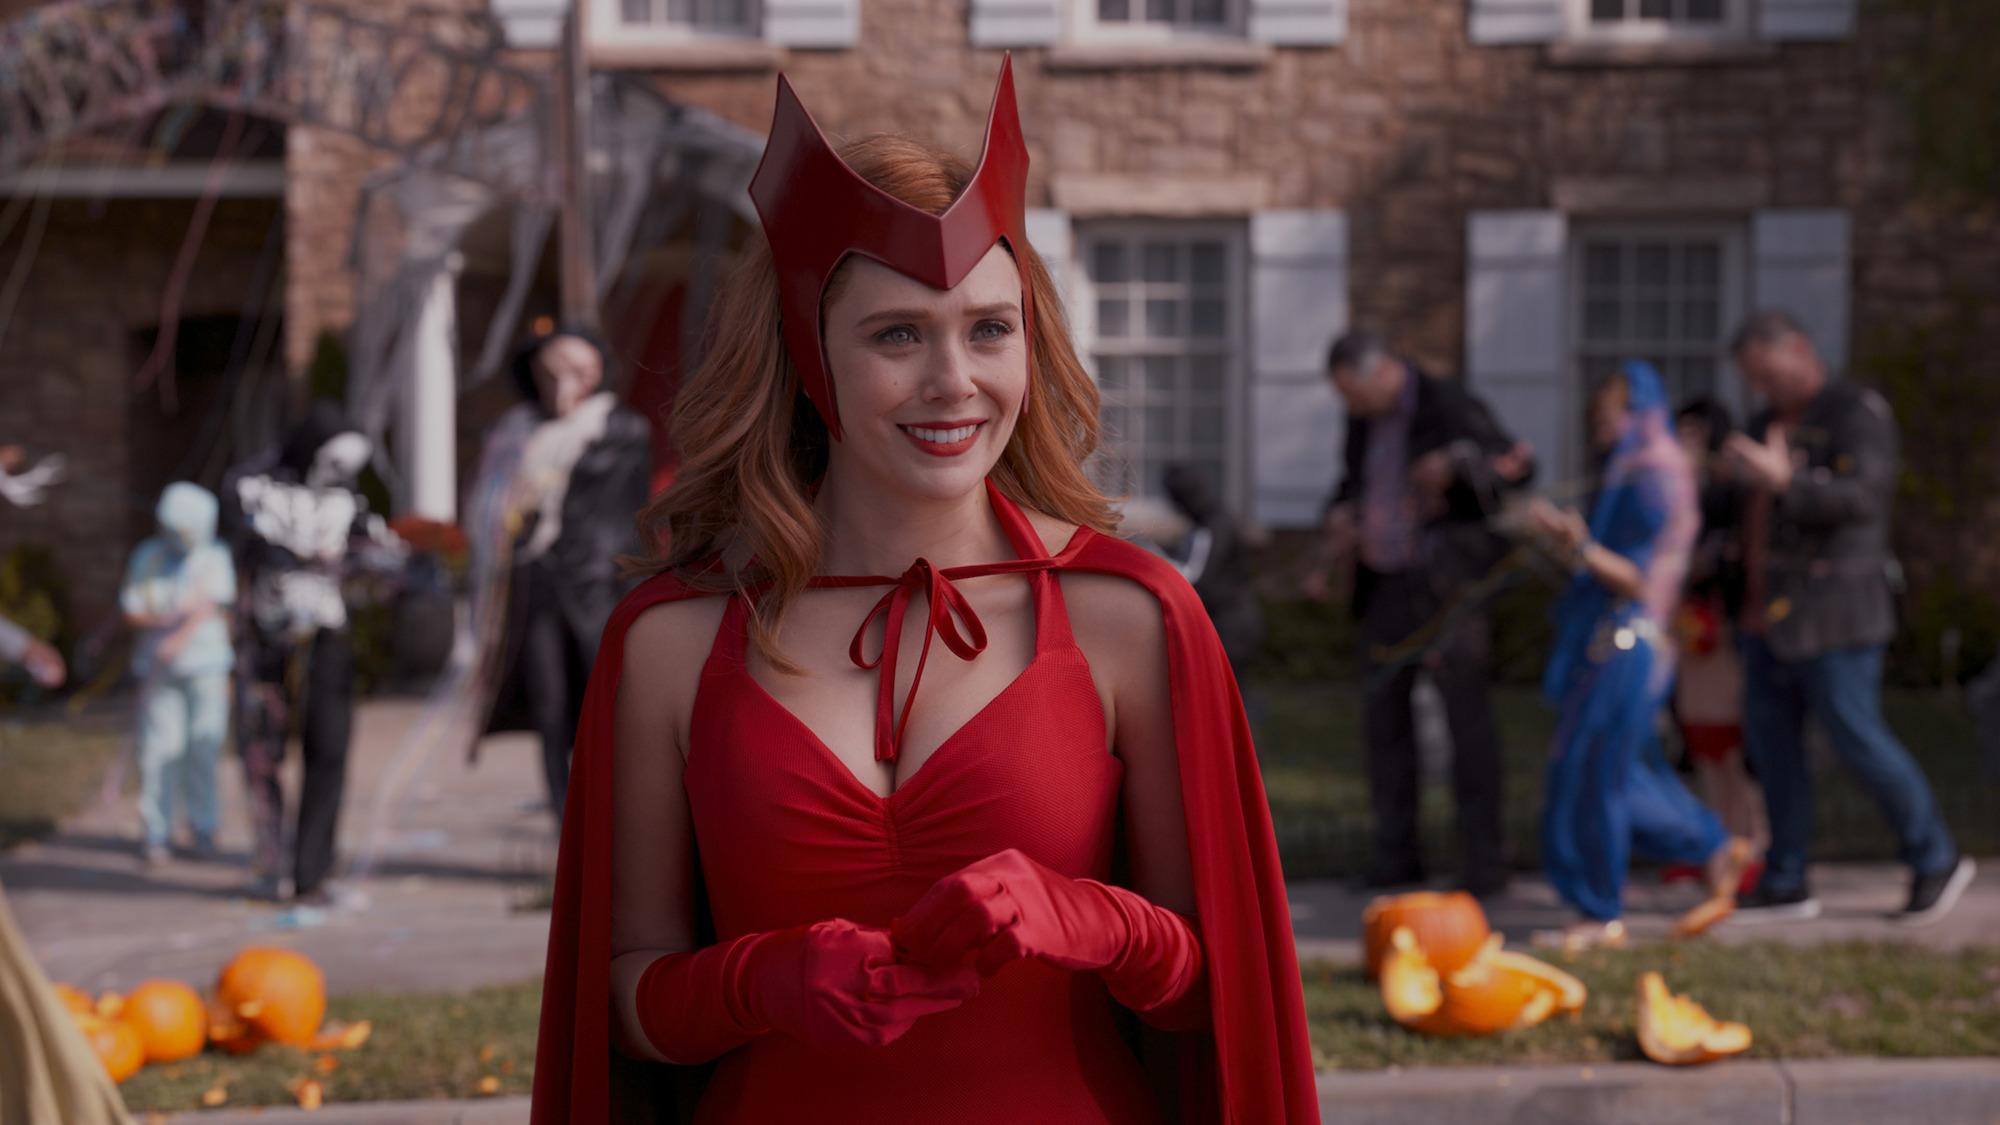 Elizabeth Olsen as Wanda Maximoff in her (nearly) comic-accurate costume in 'WandaVision' Episode 6